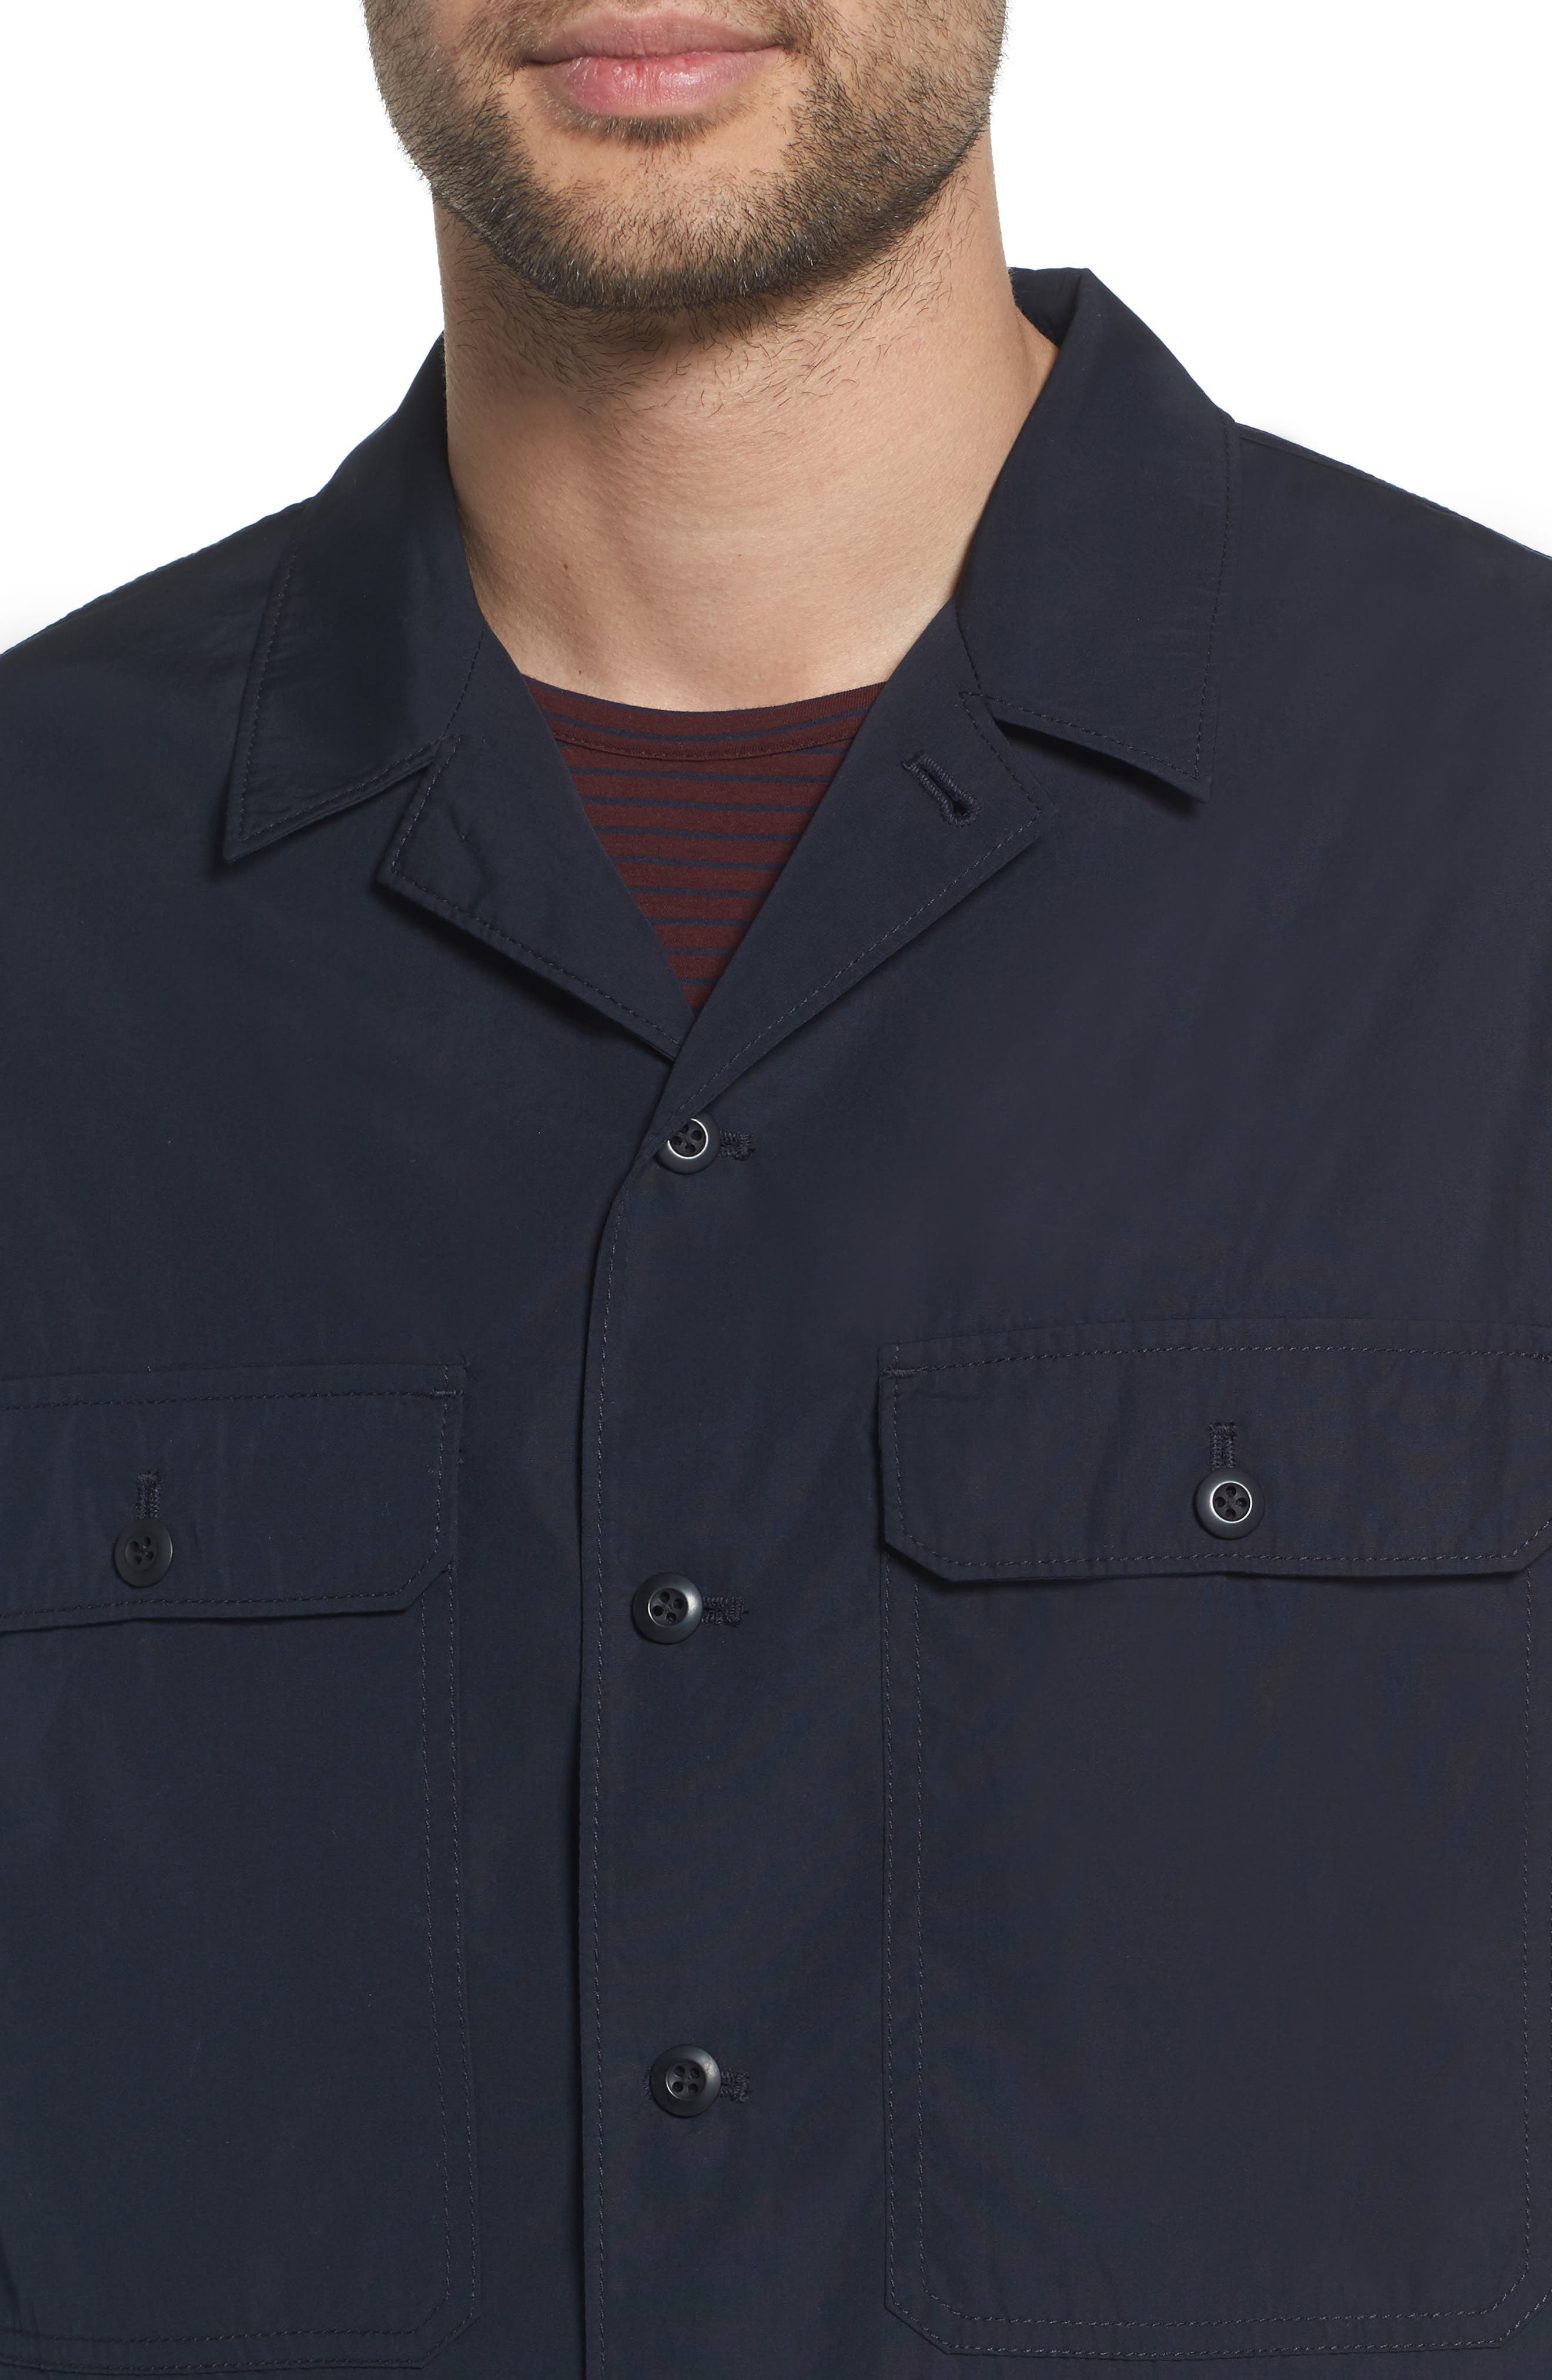 Regular Fit Shirt Jacket,                             Alternate thumbnail 4, color,                             New Coastal